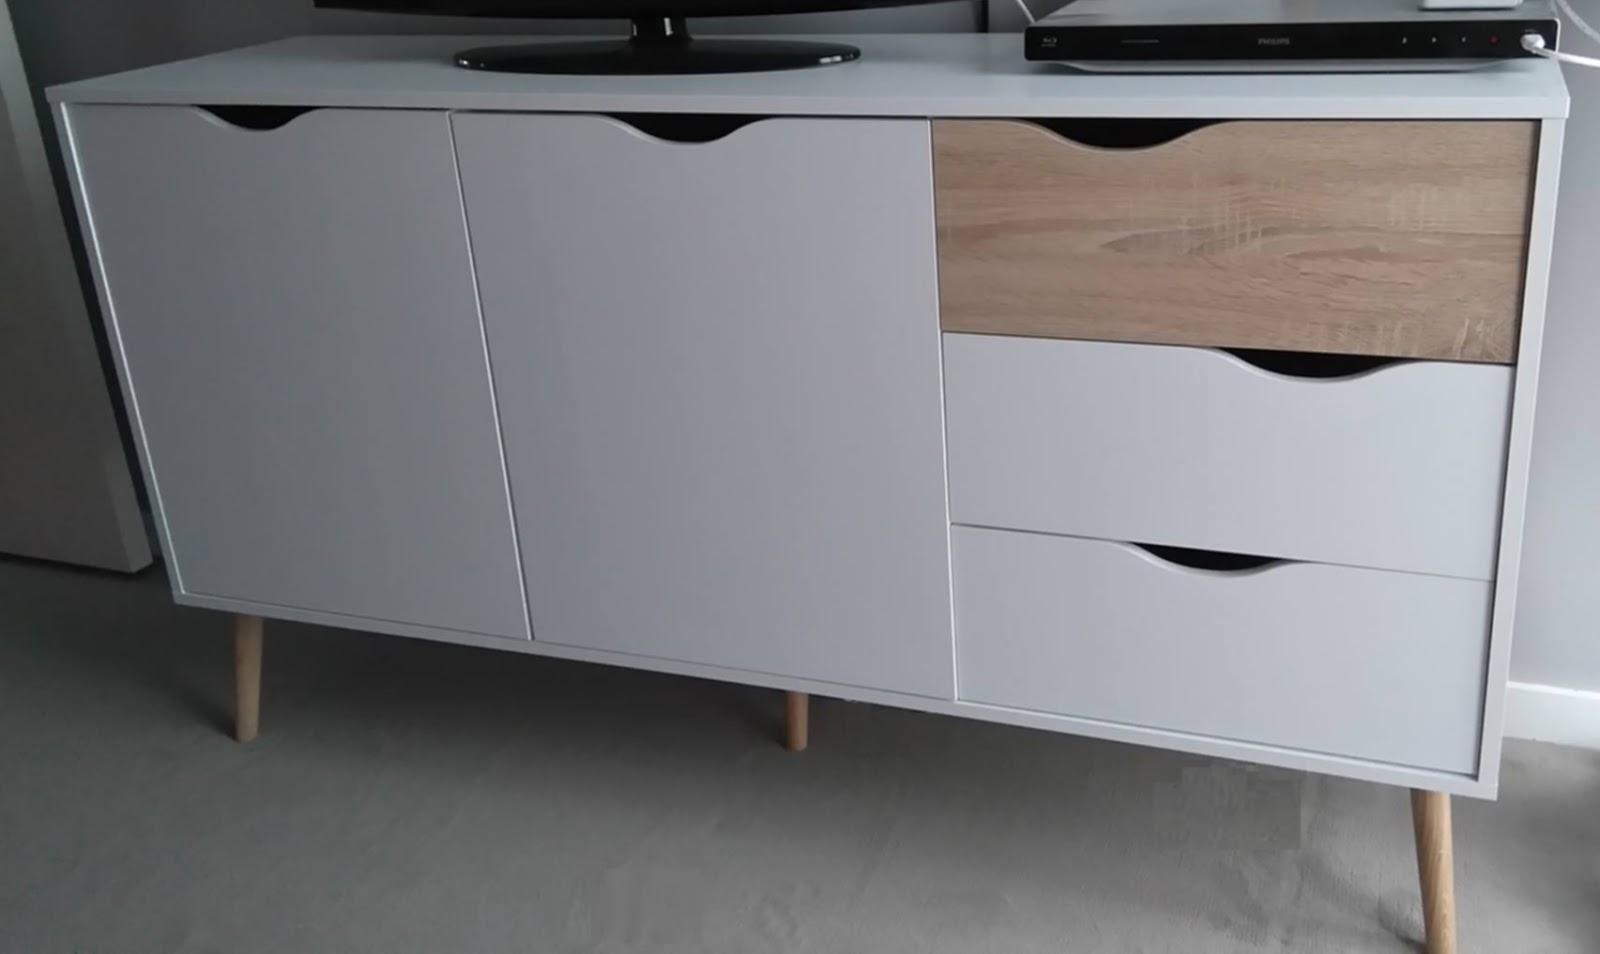 potins 180 bull 39 elodie. Black Bedroom Furniture Sets. Home Design Ideas